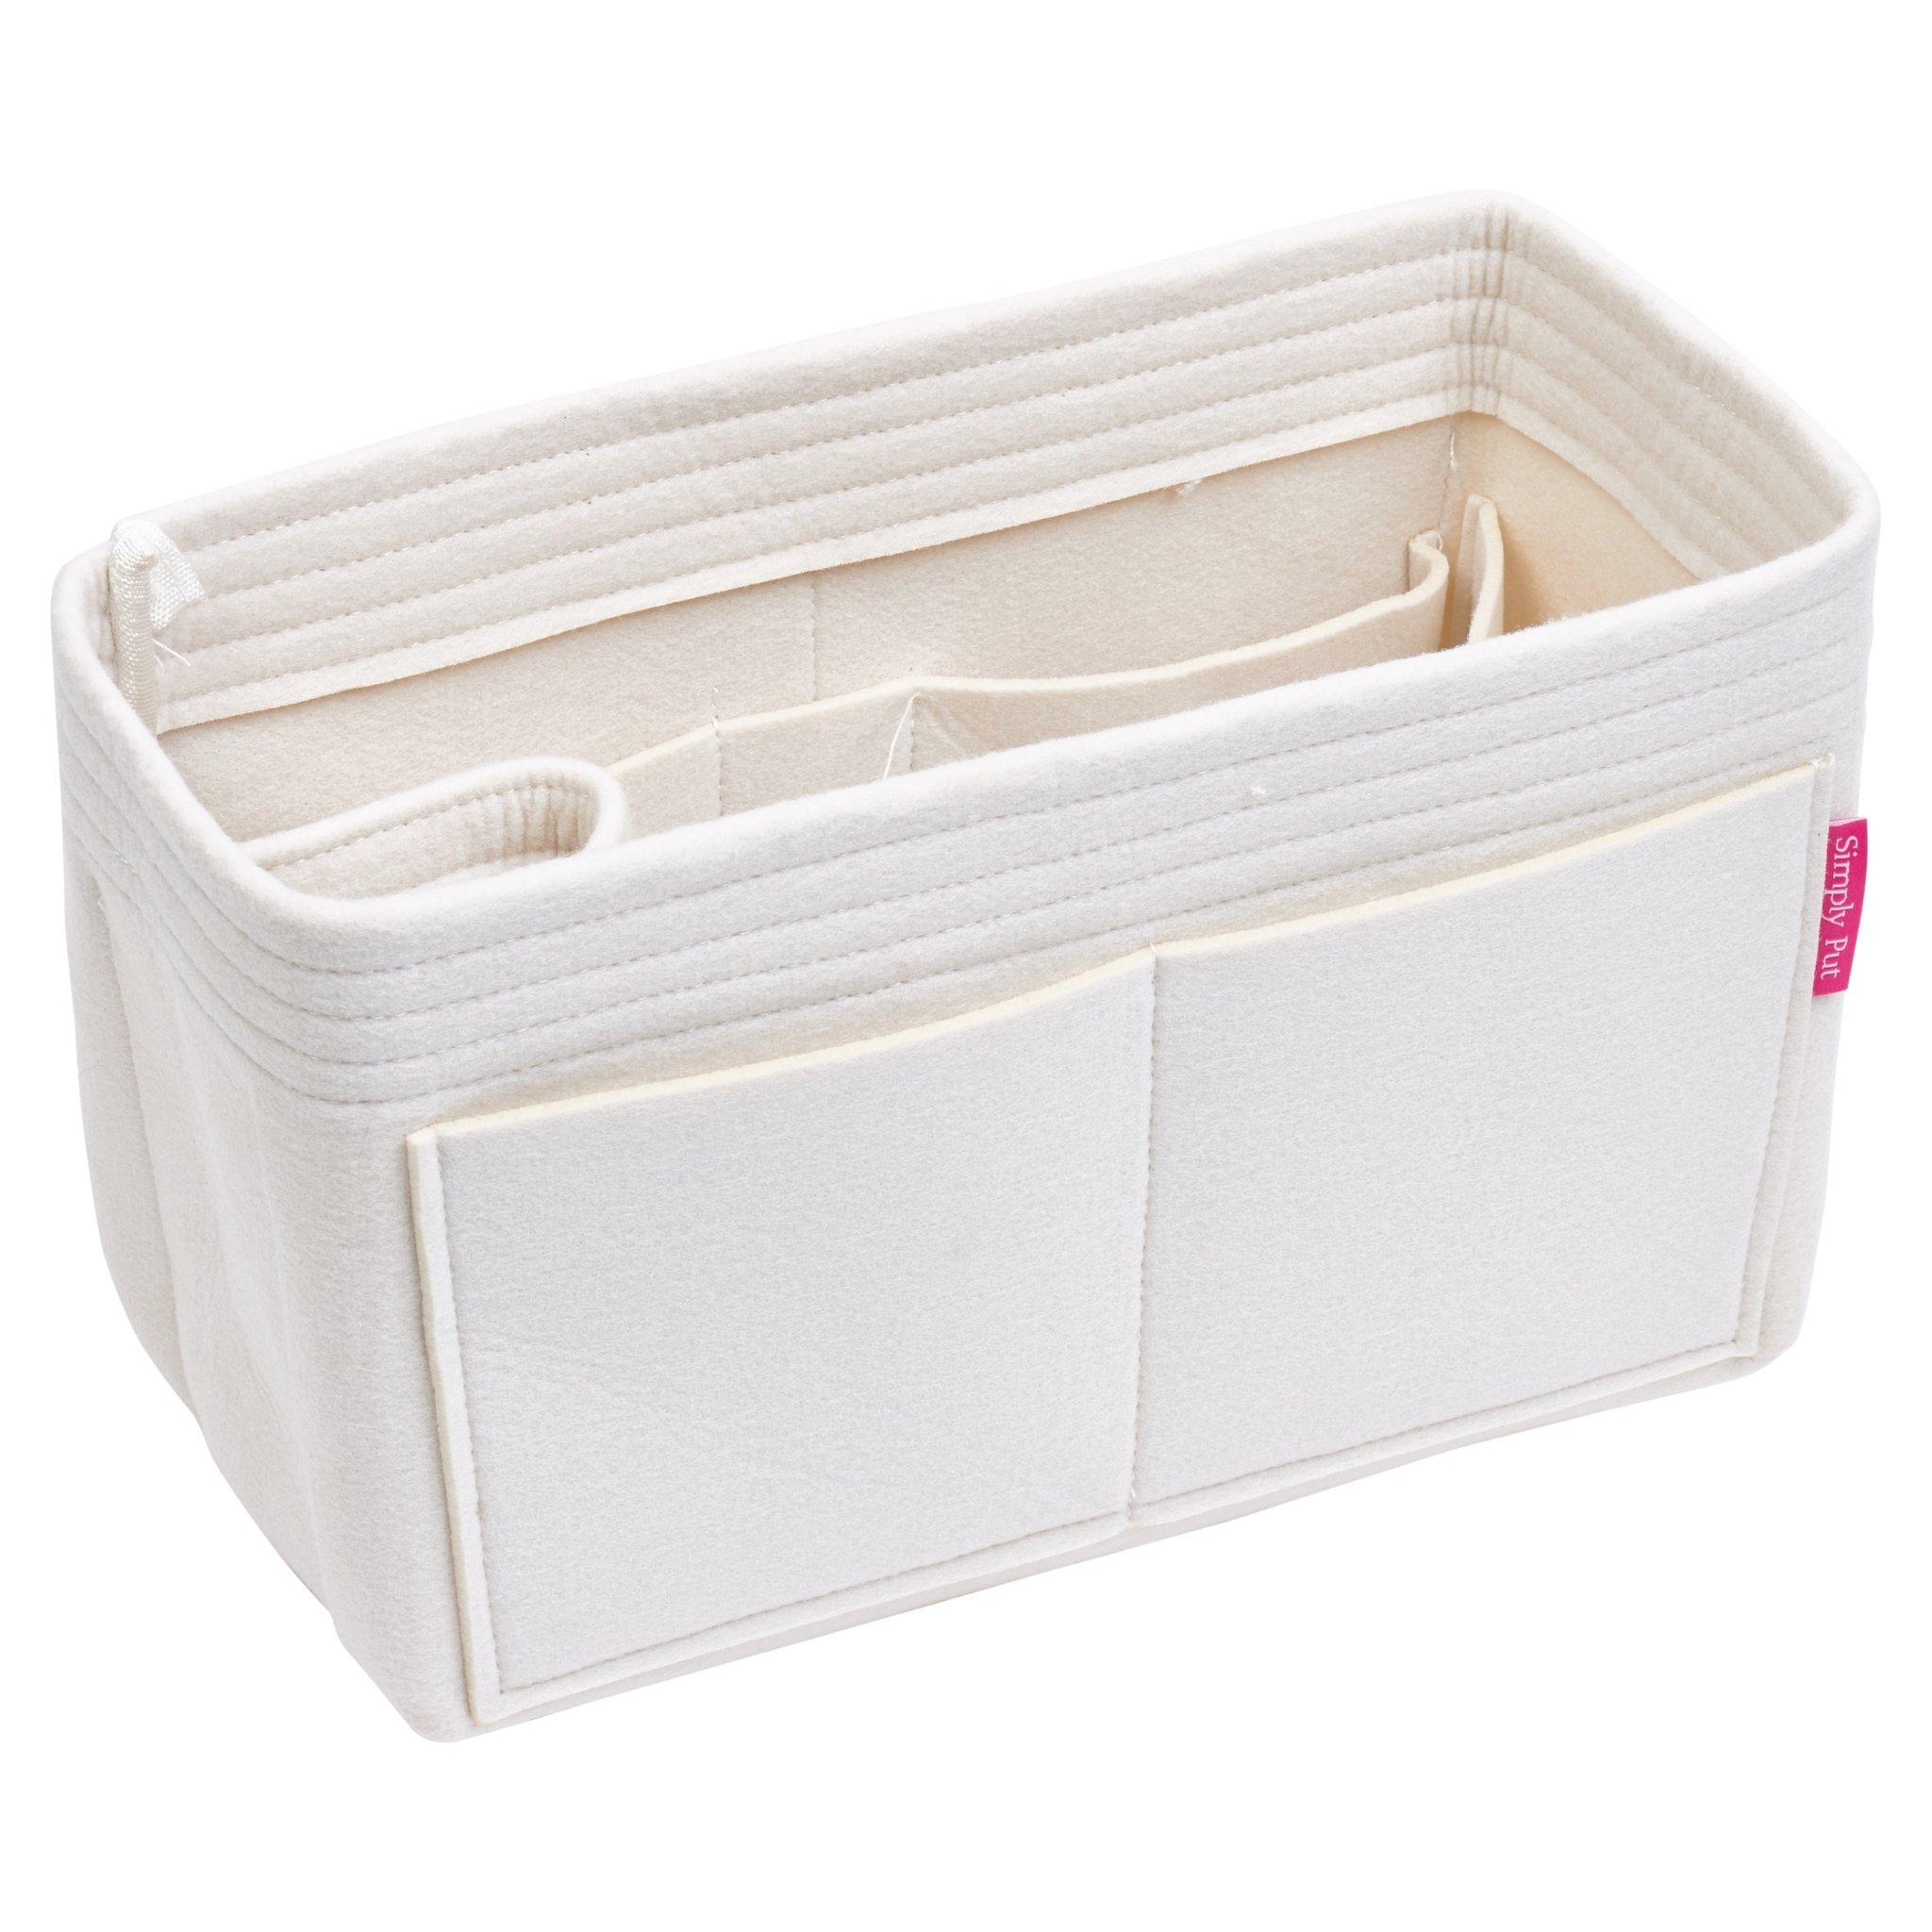 Handbag Organizer, Purse Organizer, Insert, Liner, Felt Structure Shaper X-Large, Extra Large, Light Beige